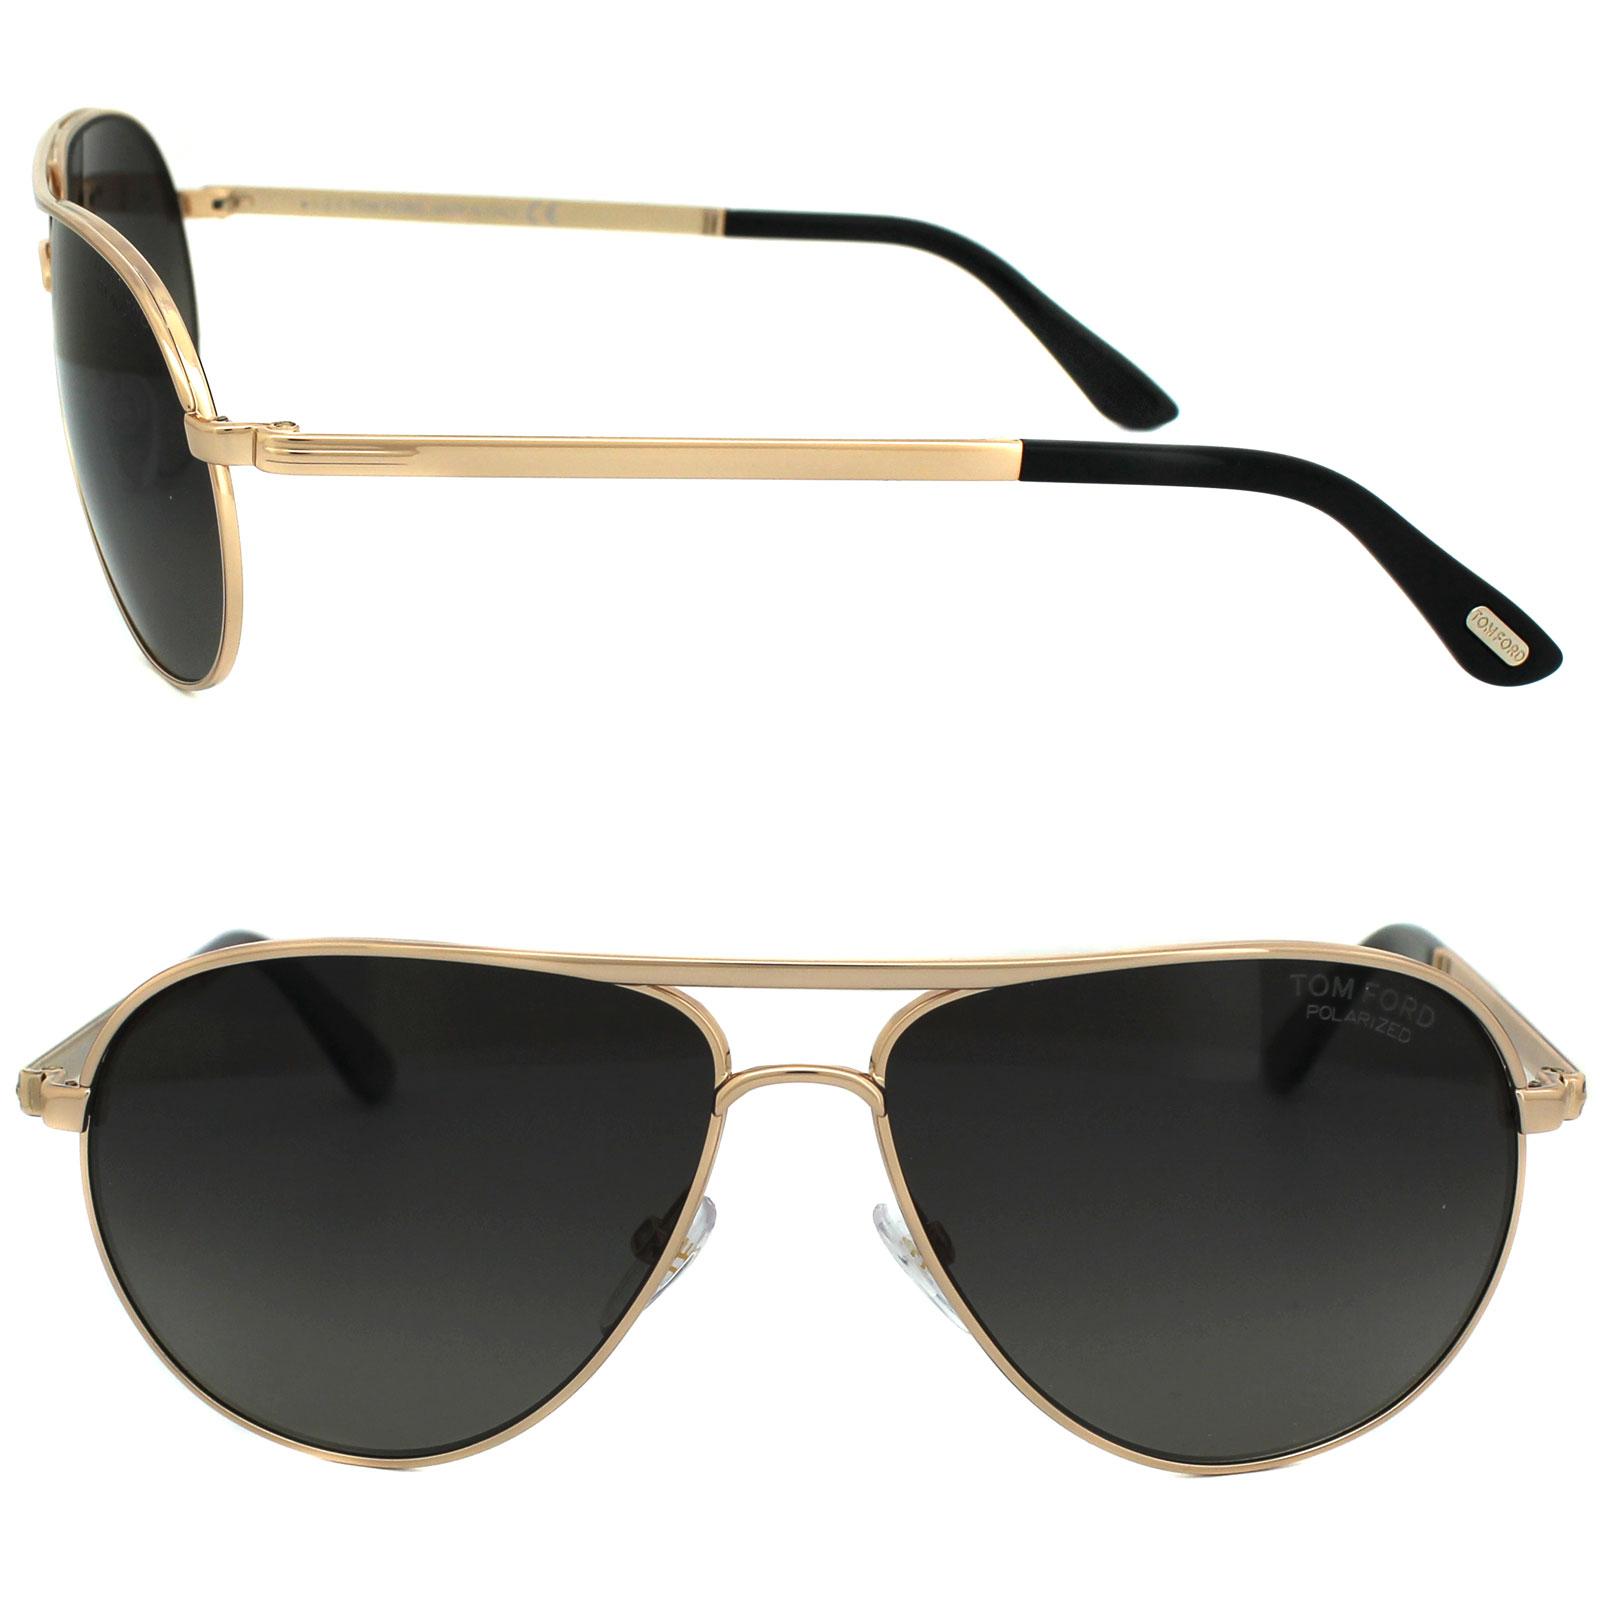 60a9047fca4 Sentinel Tom Ford Sunglasses 0144 Marko 28D Shiny Rose Gold Smoke Grey  Polarized